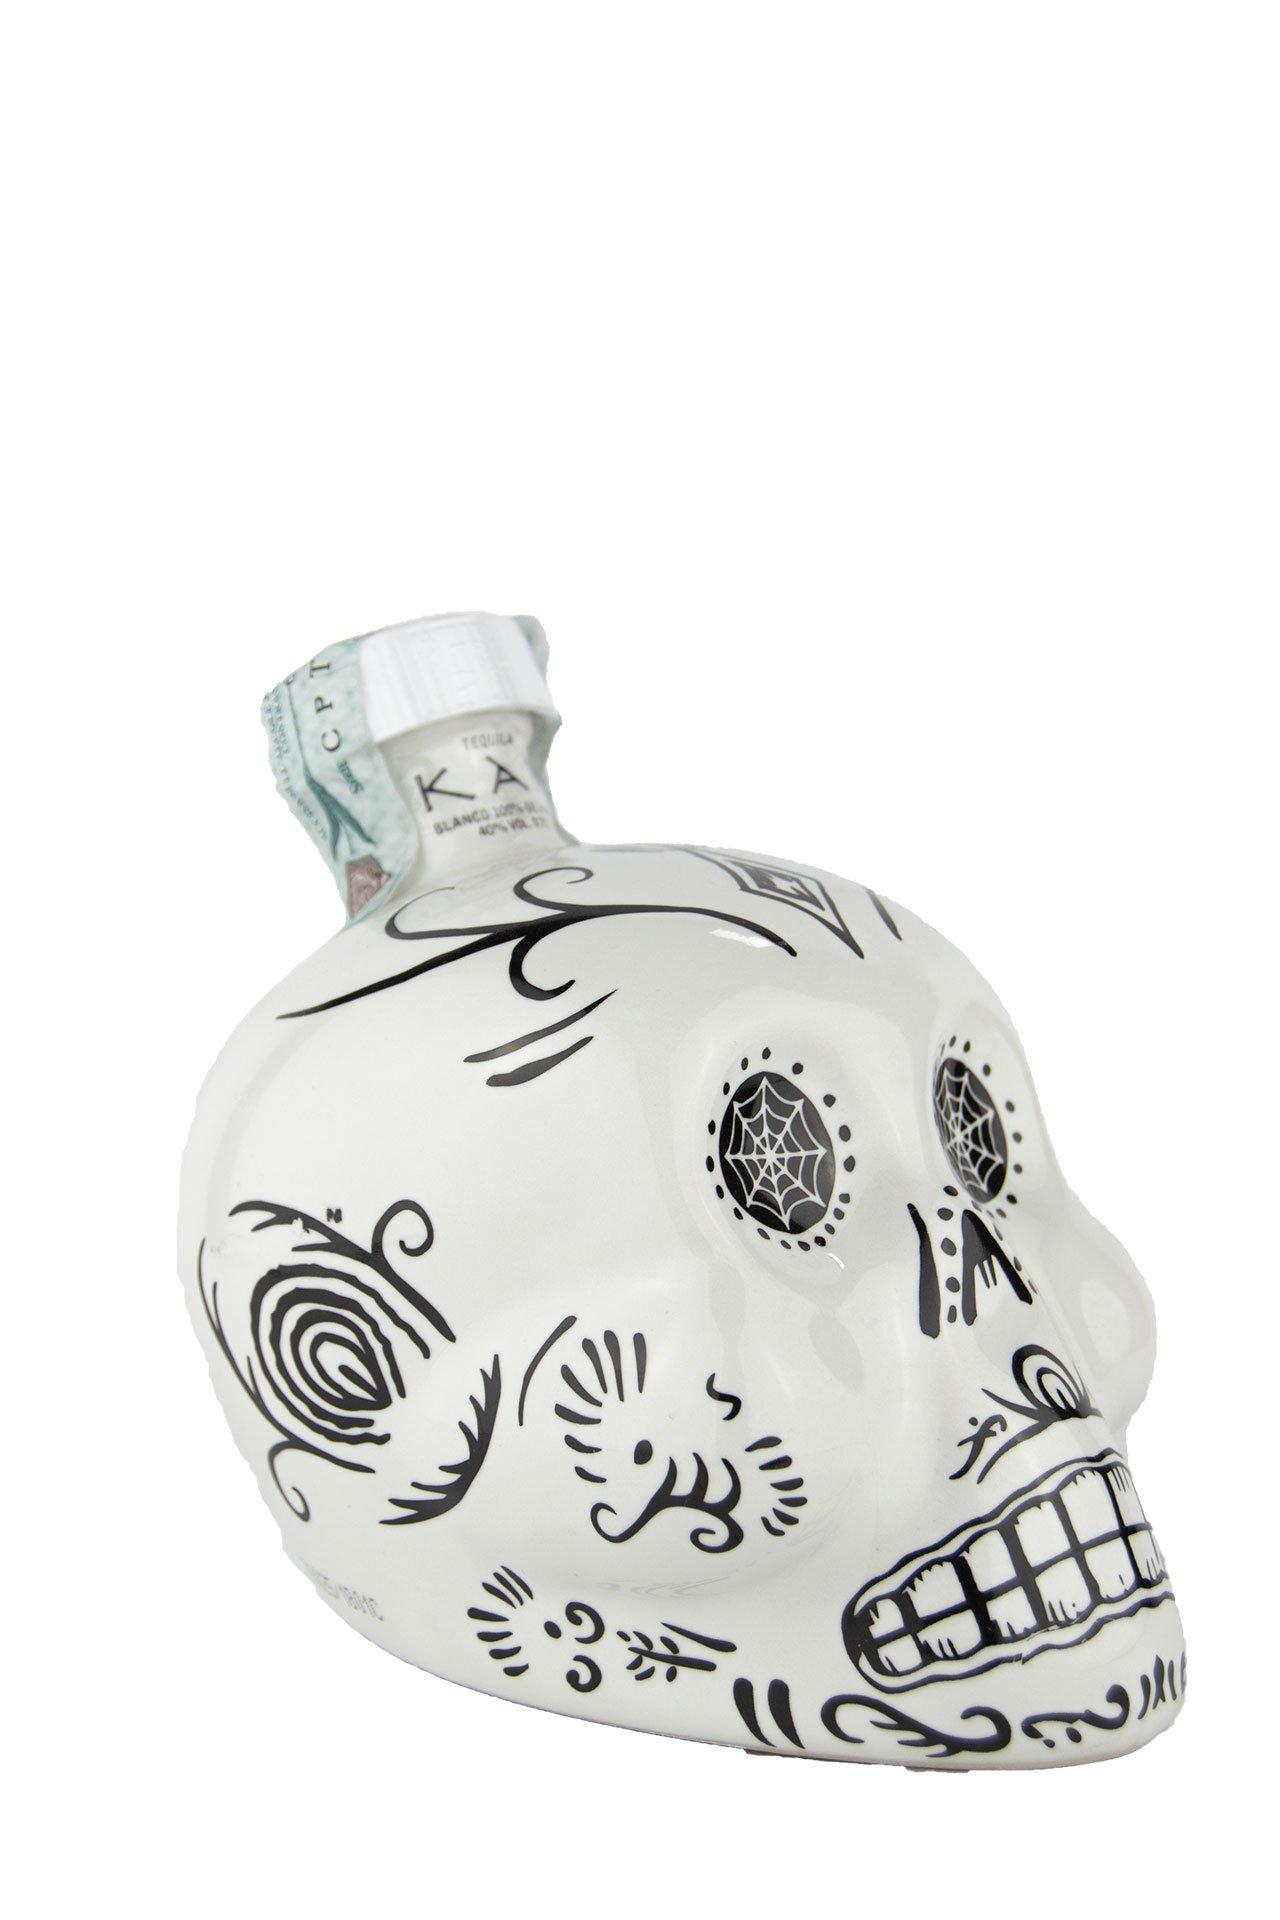 Kah – Tequila Blanco